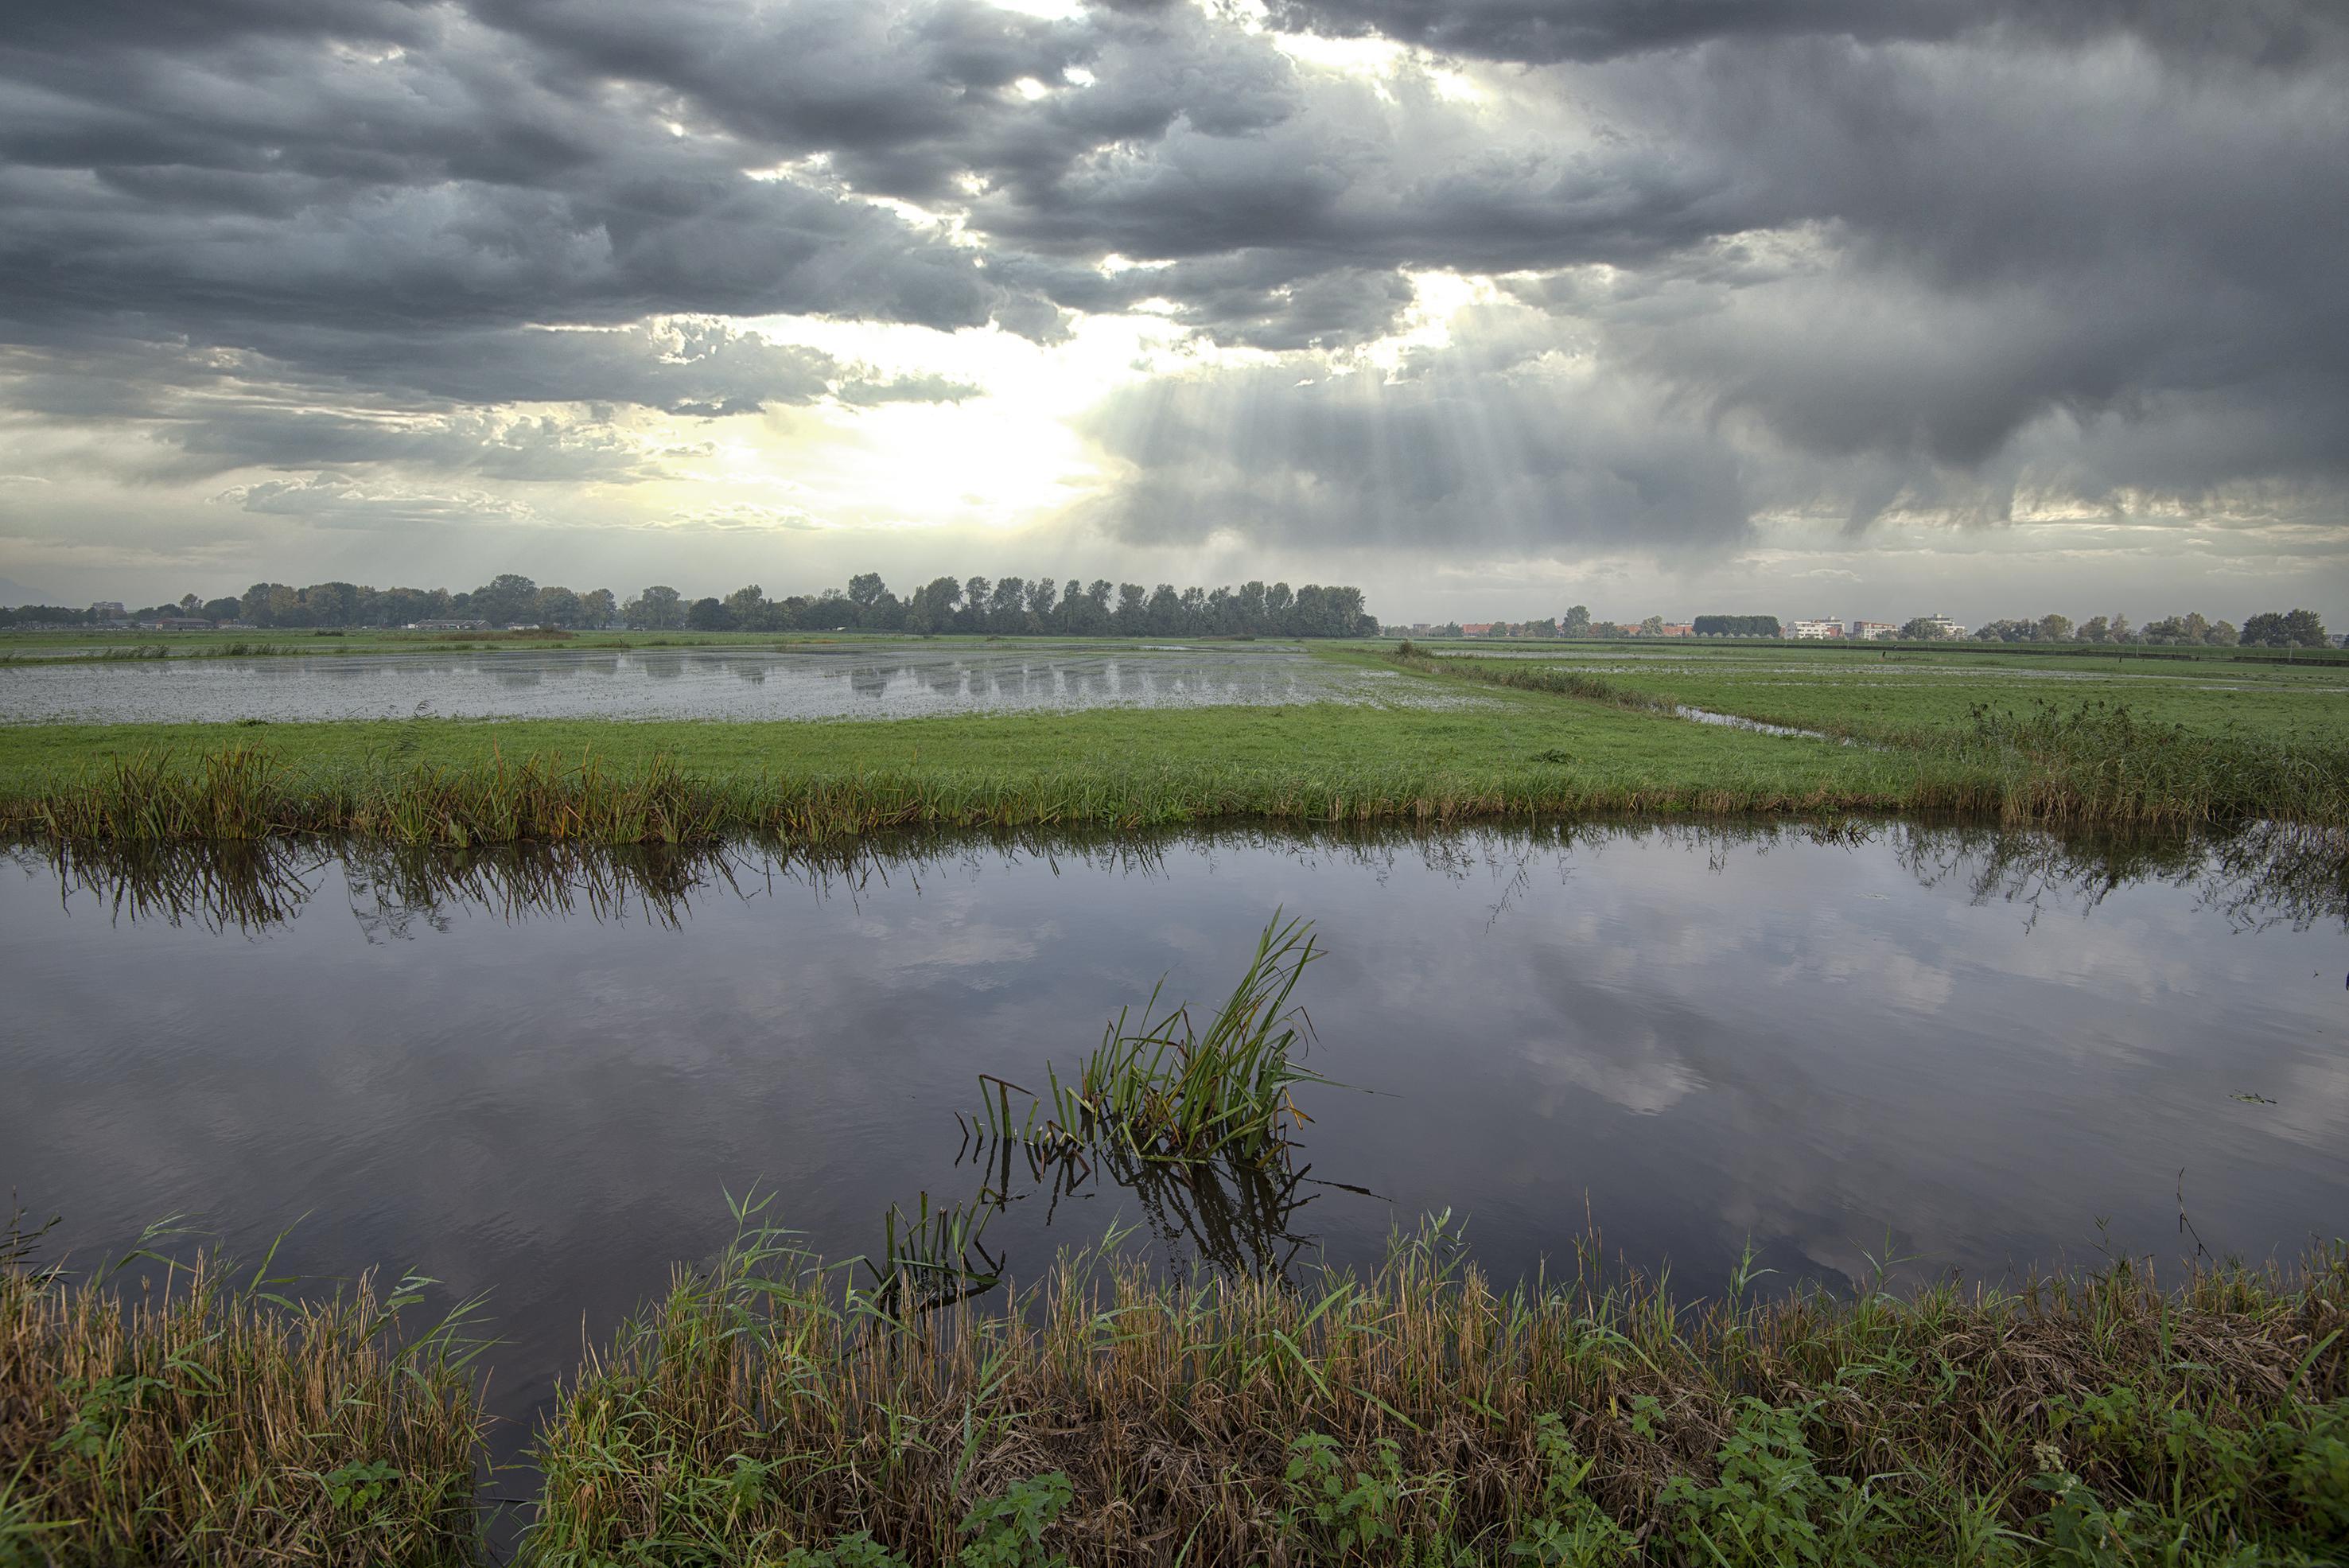 Fietsexcursie rond Spaarndam: vijfduizend jaar terugzien